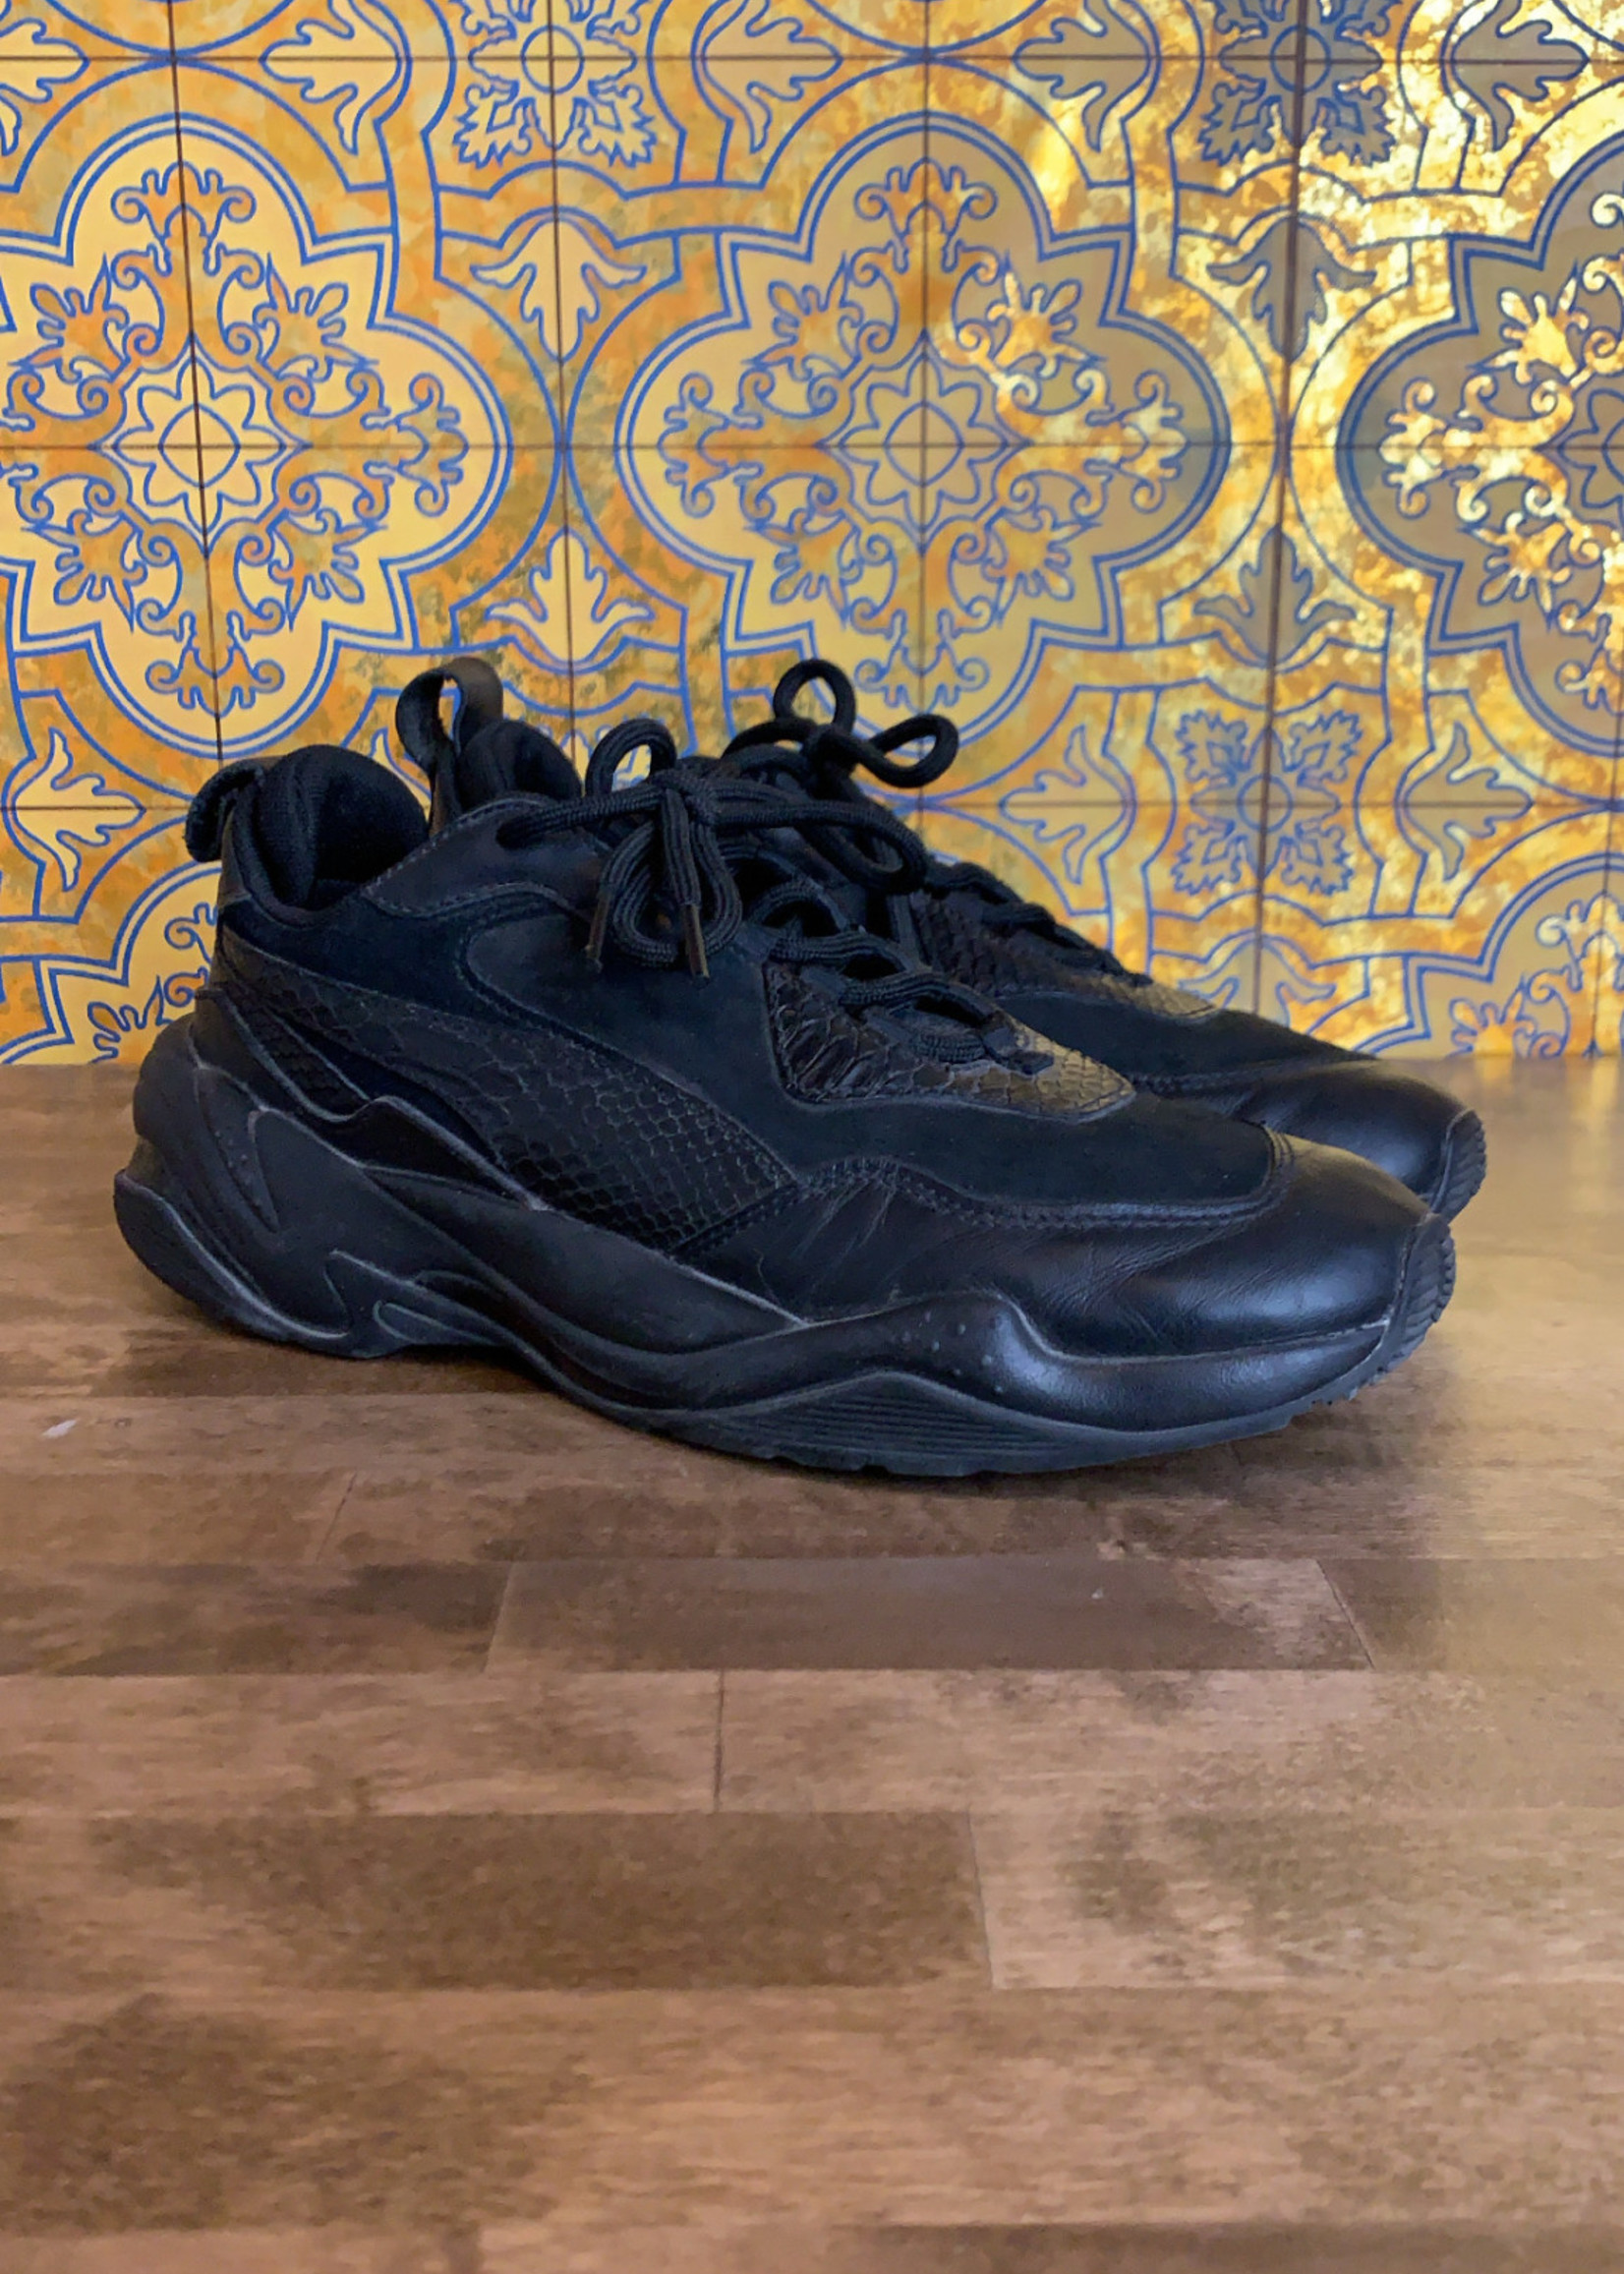 Puma Thunder Spectra Black Sneakers 9.5